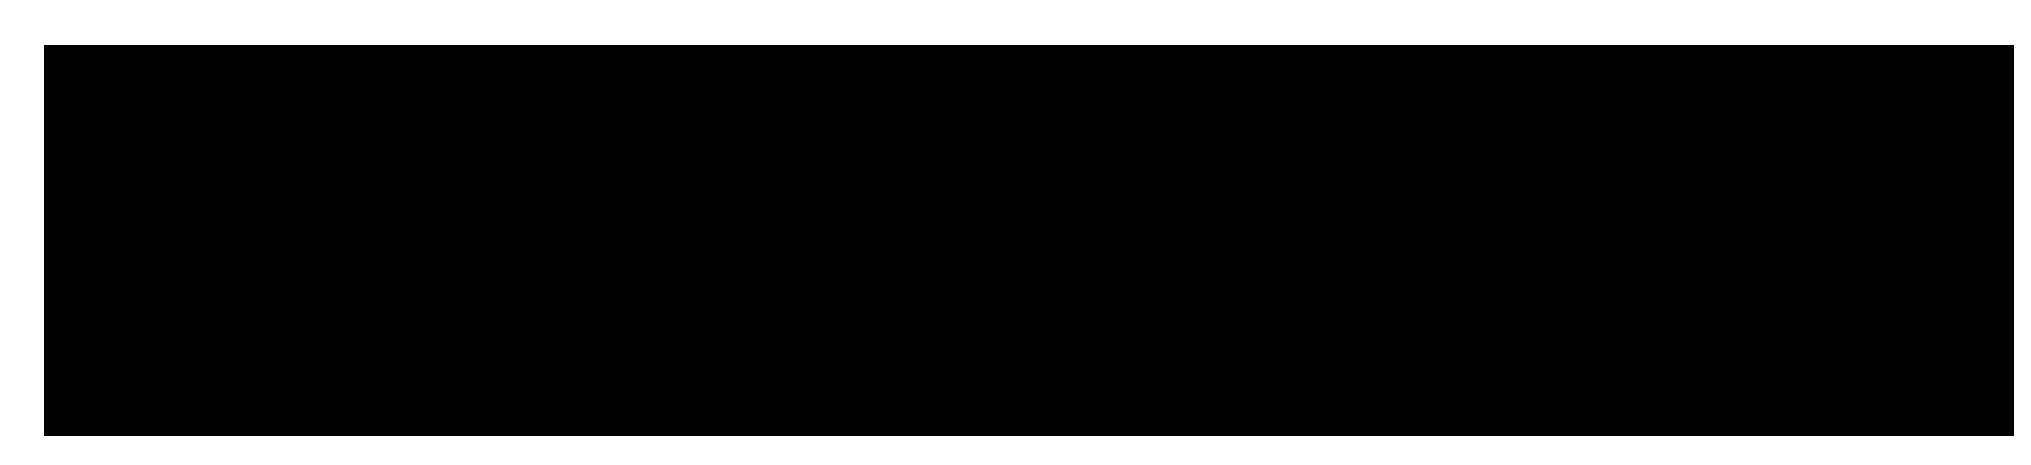 ace_logo-b1.png